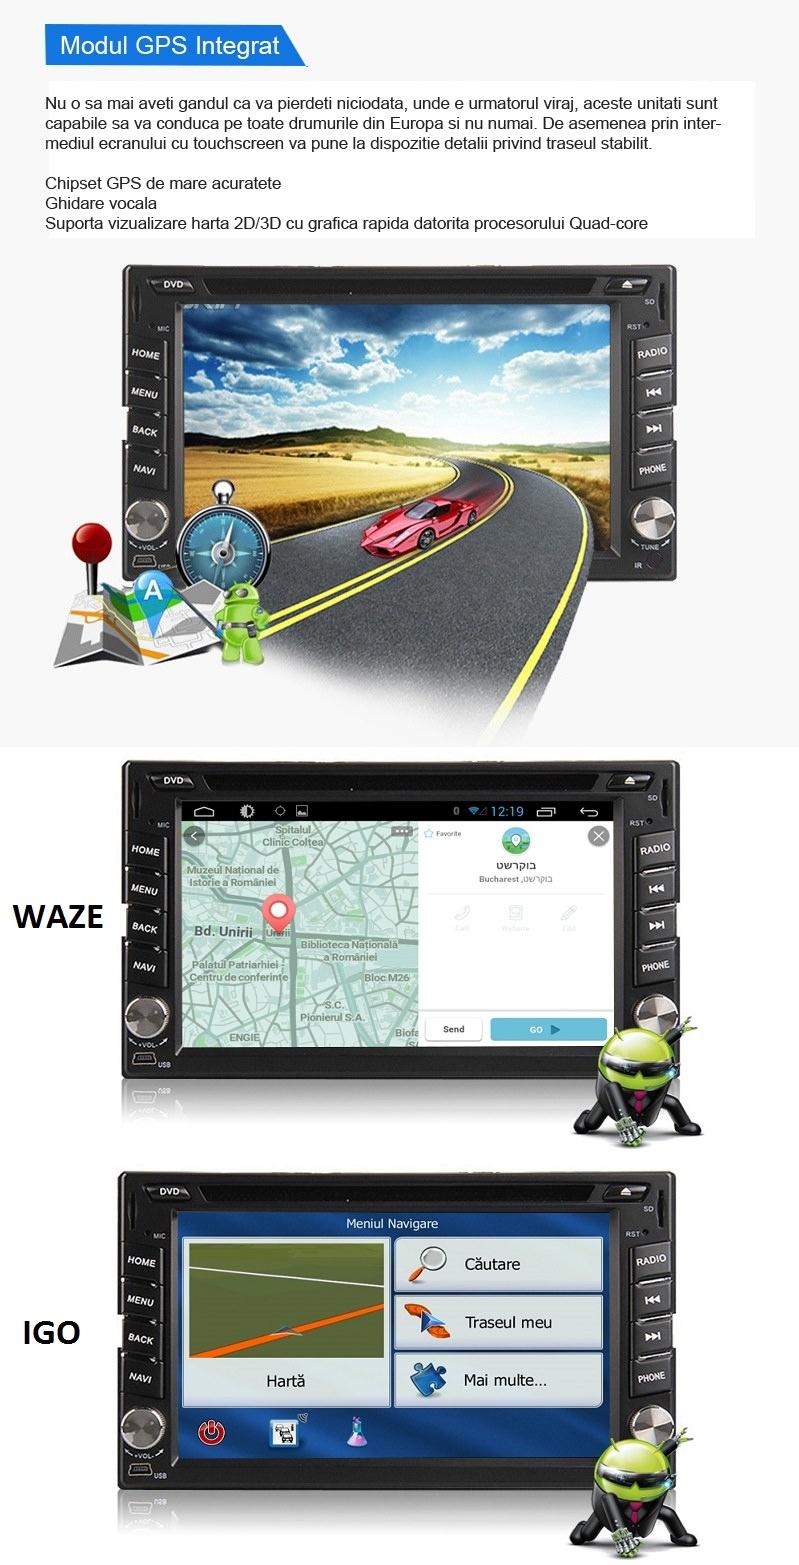 sistem de navigatie gps offline igo si online waze_1